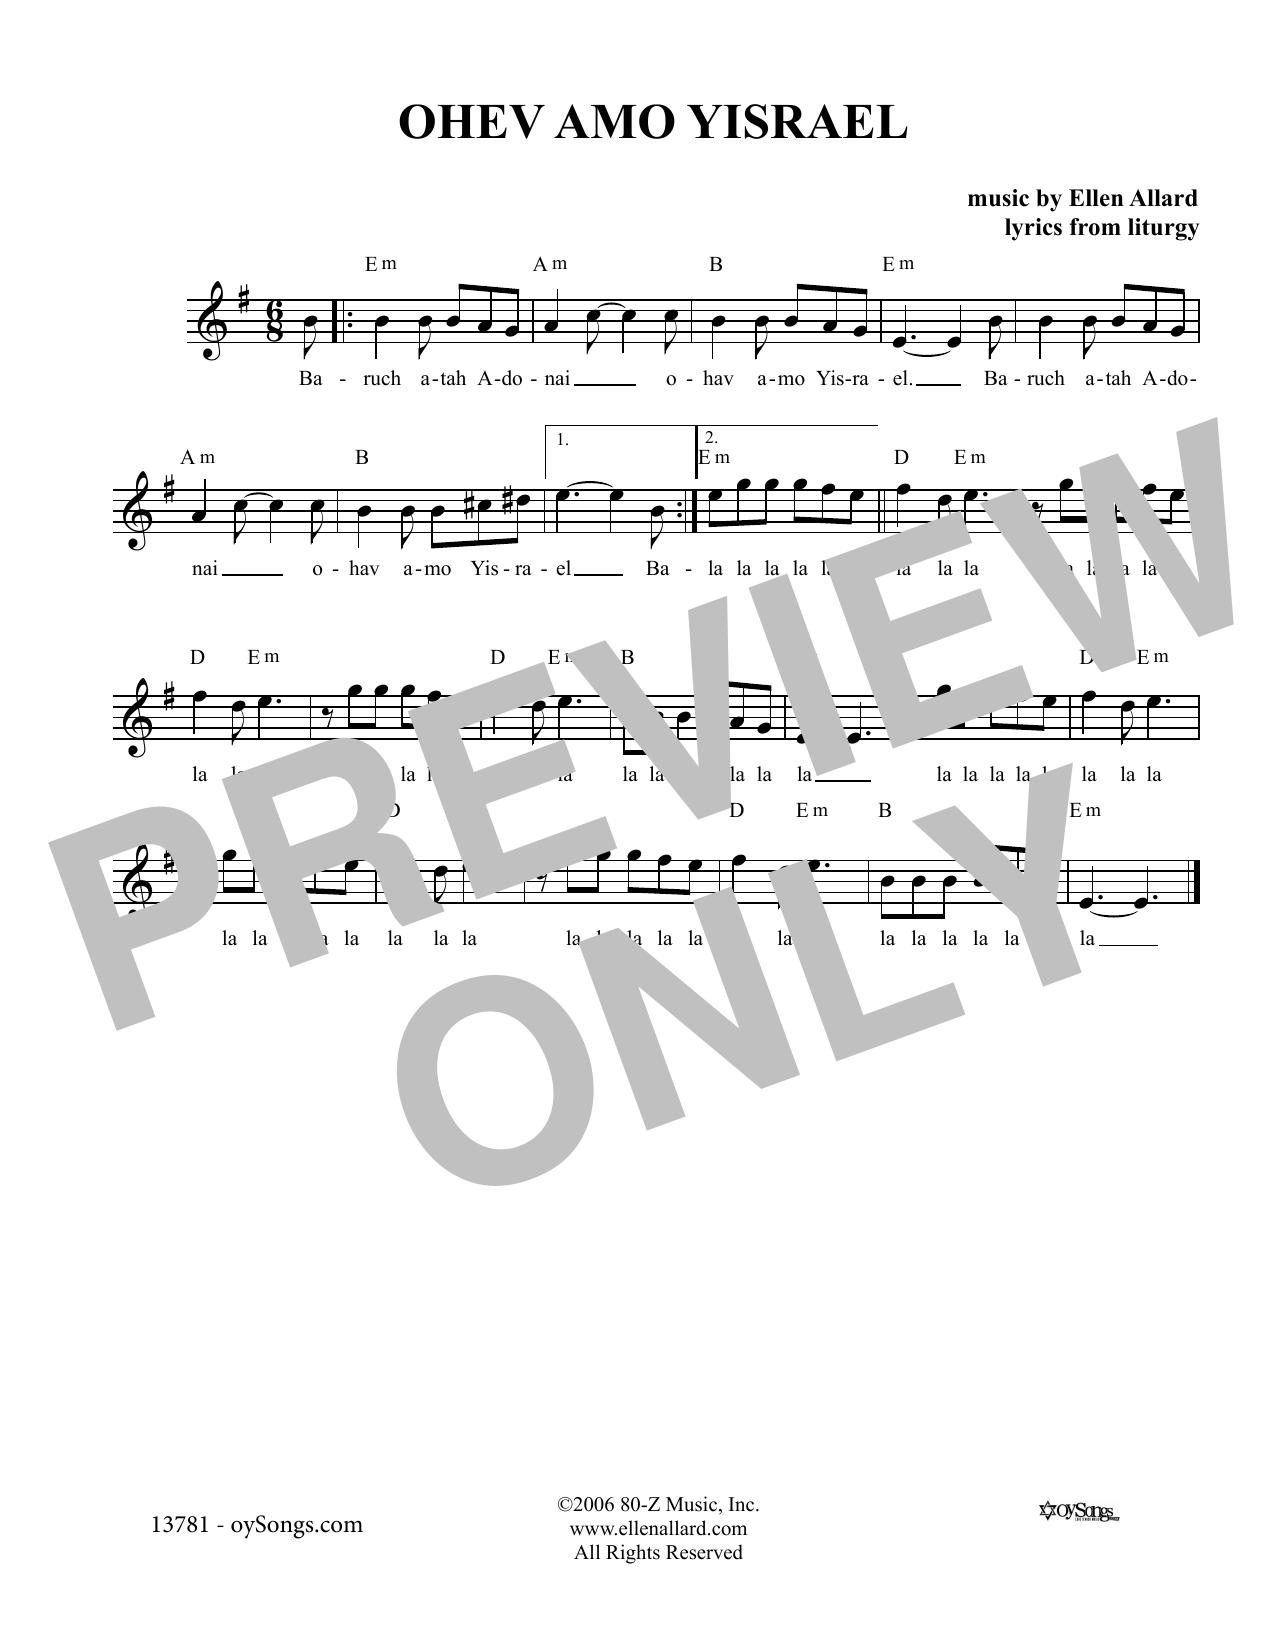 Ellen Allard Ohev Amo Yisrael sheet music notes and chords. Download Printable PDF.